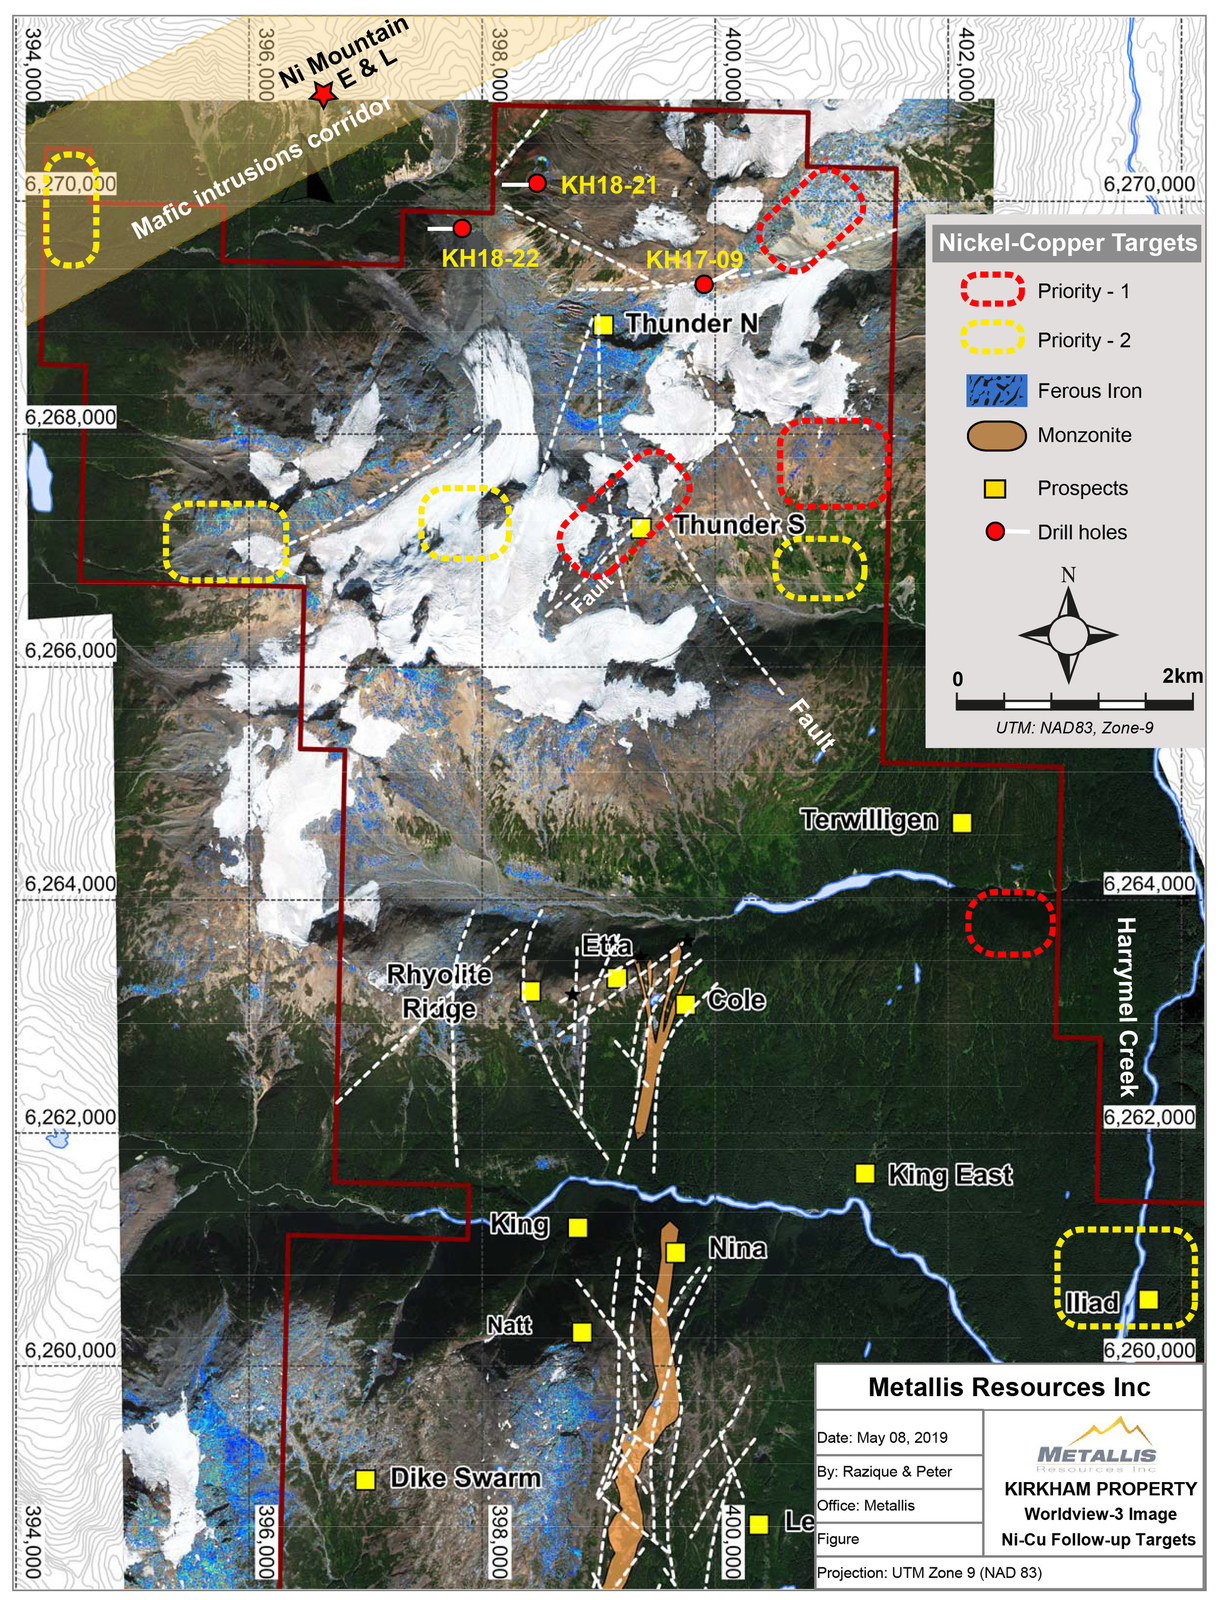 Metallis Resources Inc - Kirkham Property - Worldview-3 Image - Ni-Cu Followup Target Map